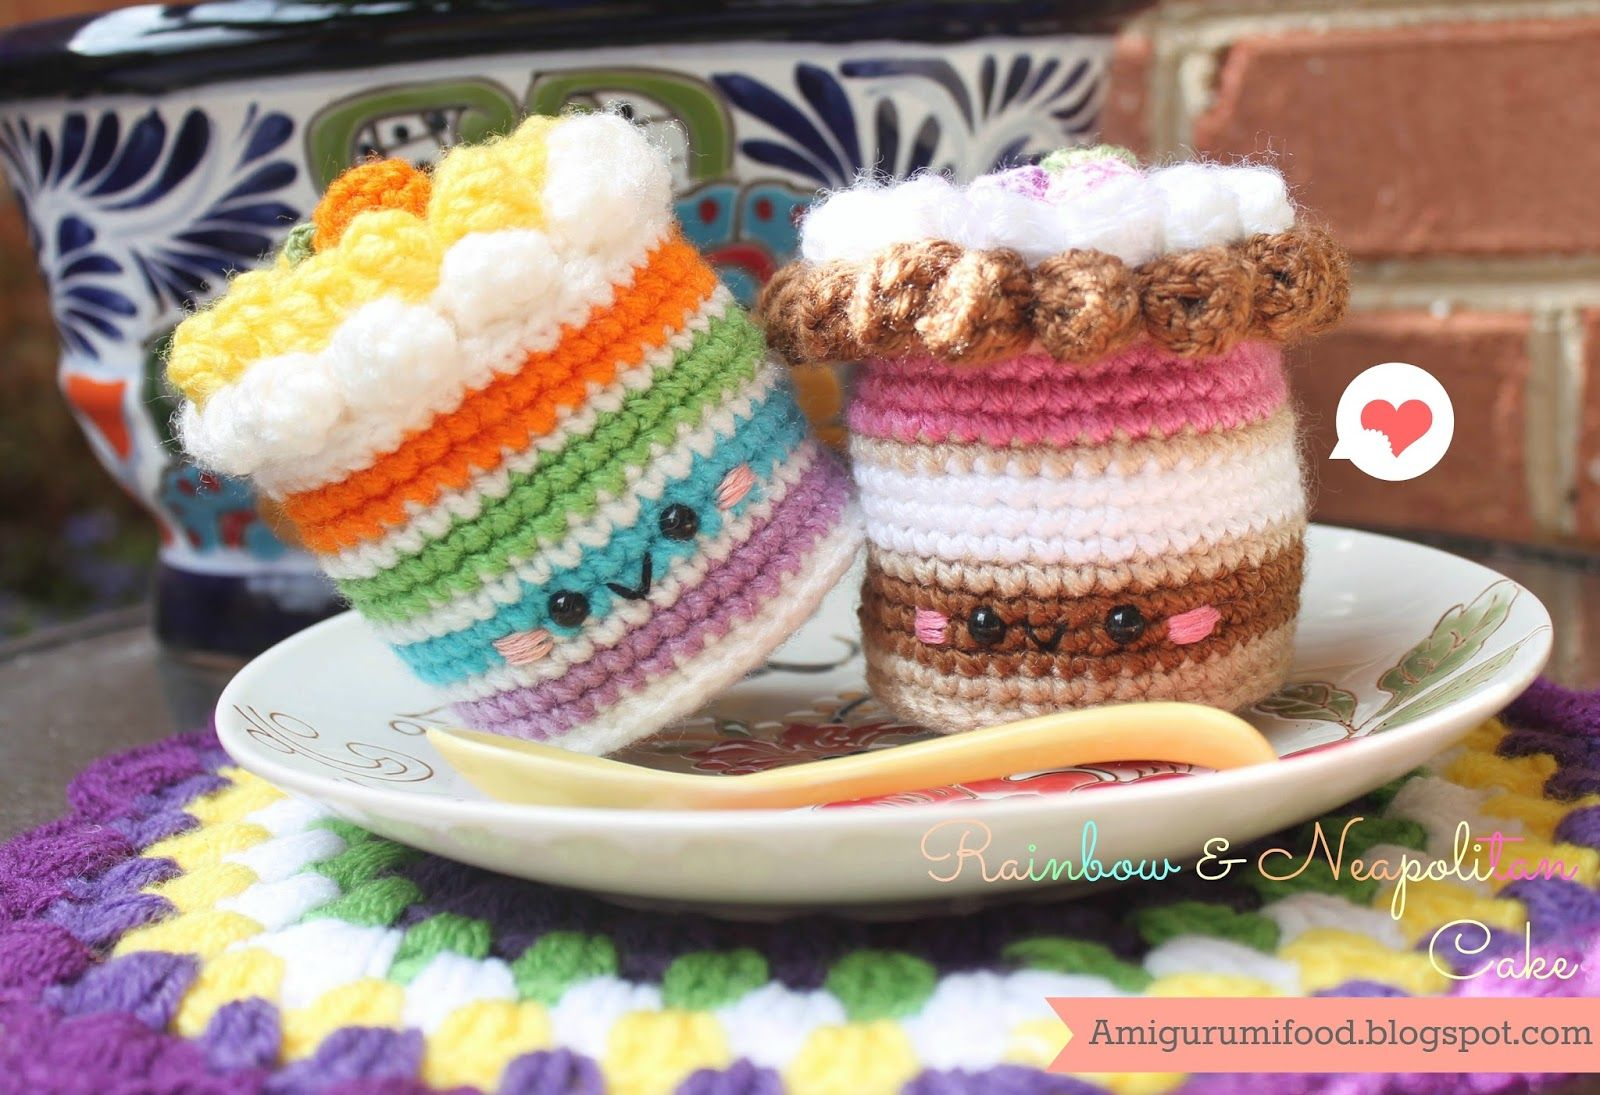 Rainbow & Neapolitan Cake Free pattern! | Web Patterns & Giveaways ...